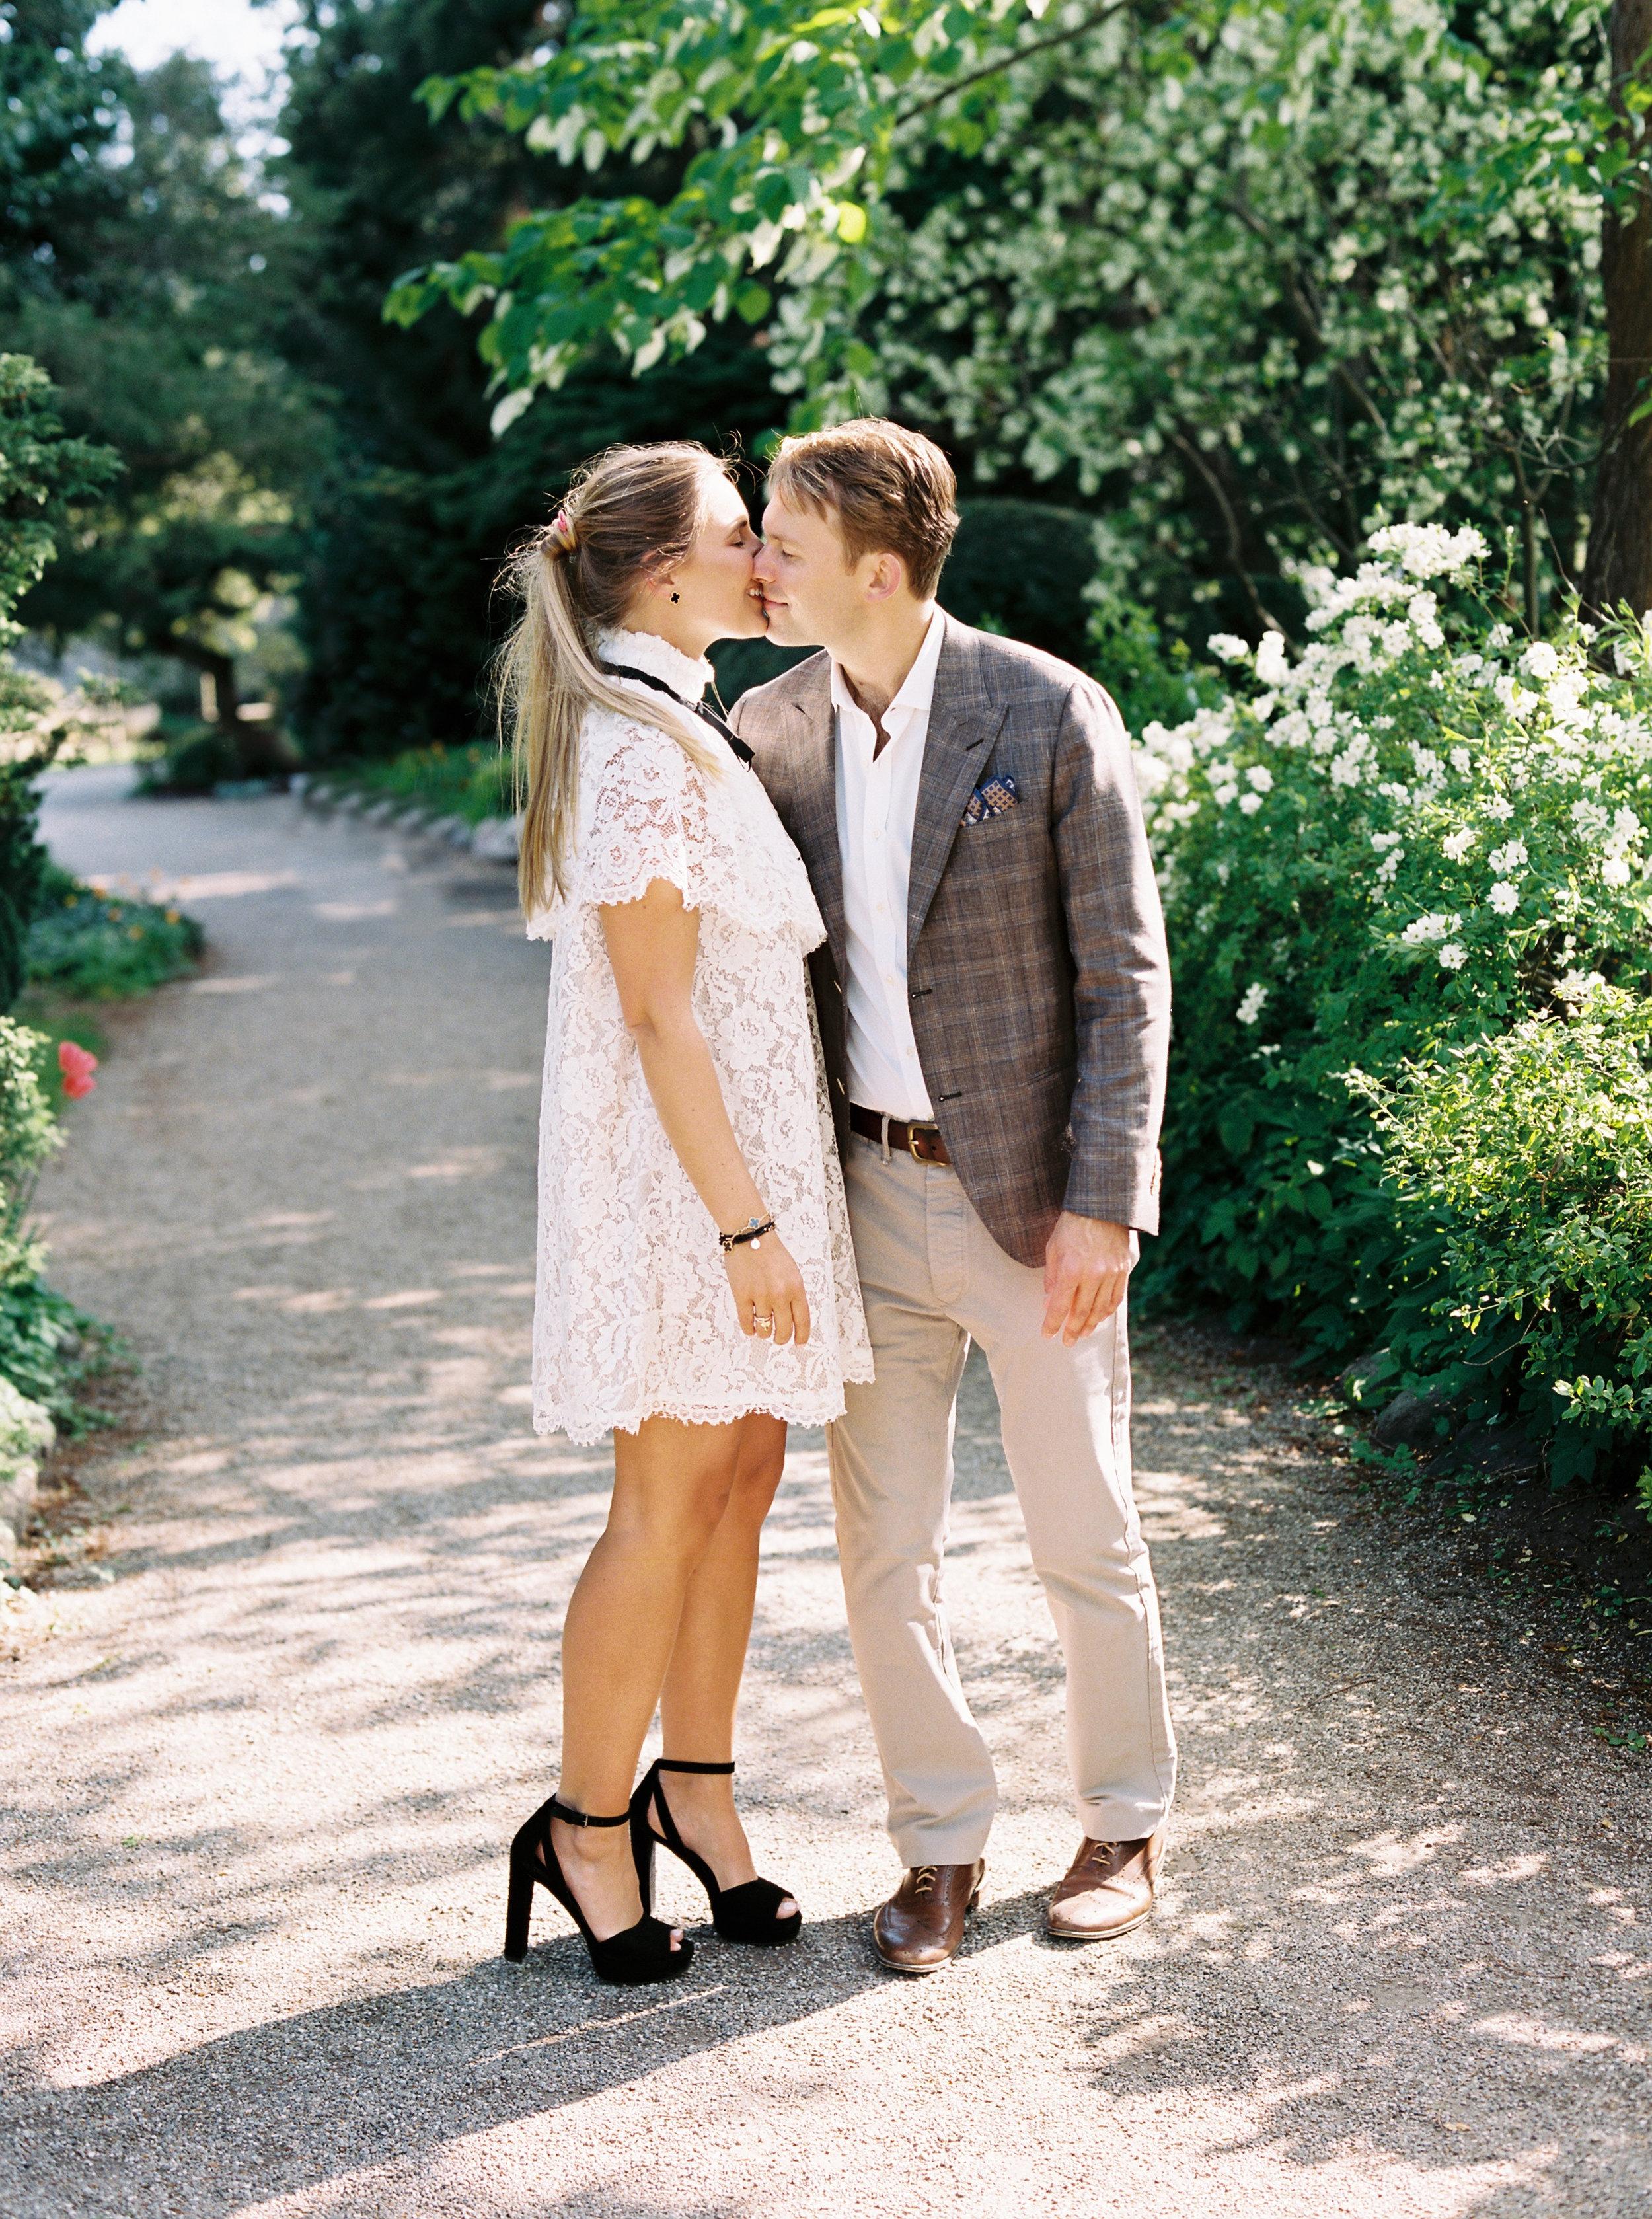 Kyle John l Fine Art Wedding Photography l Chicago, Copenhagen, California, New York, Destination l Blog l Alexis and Zach_Copenhagen Part 1_22